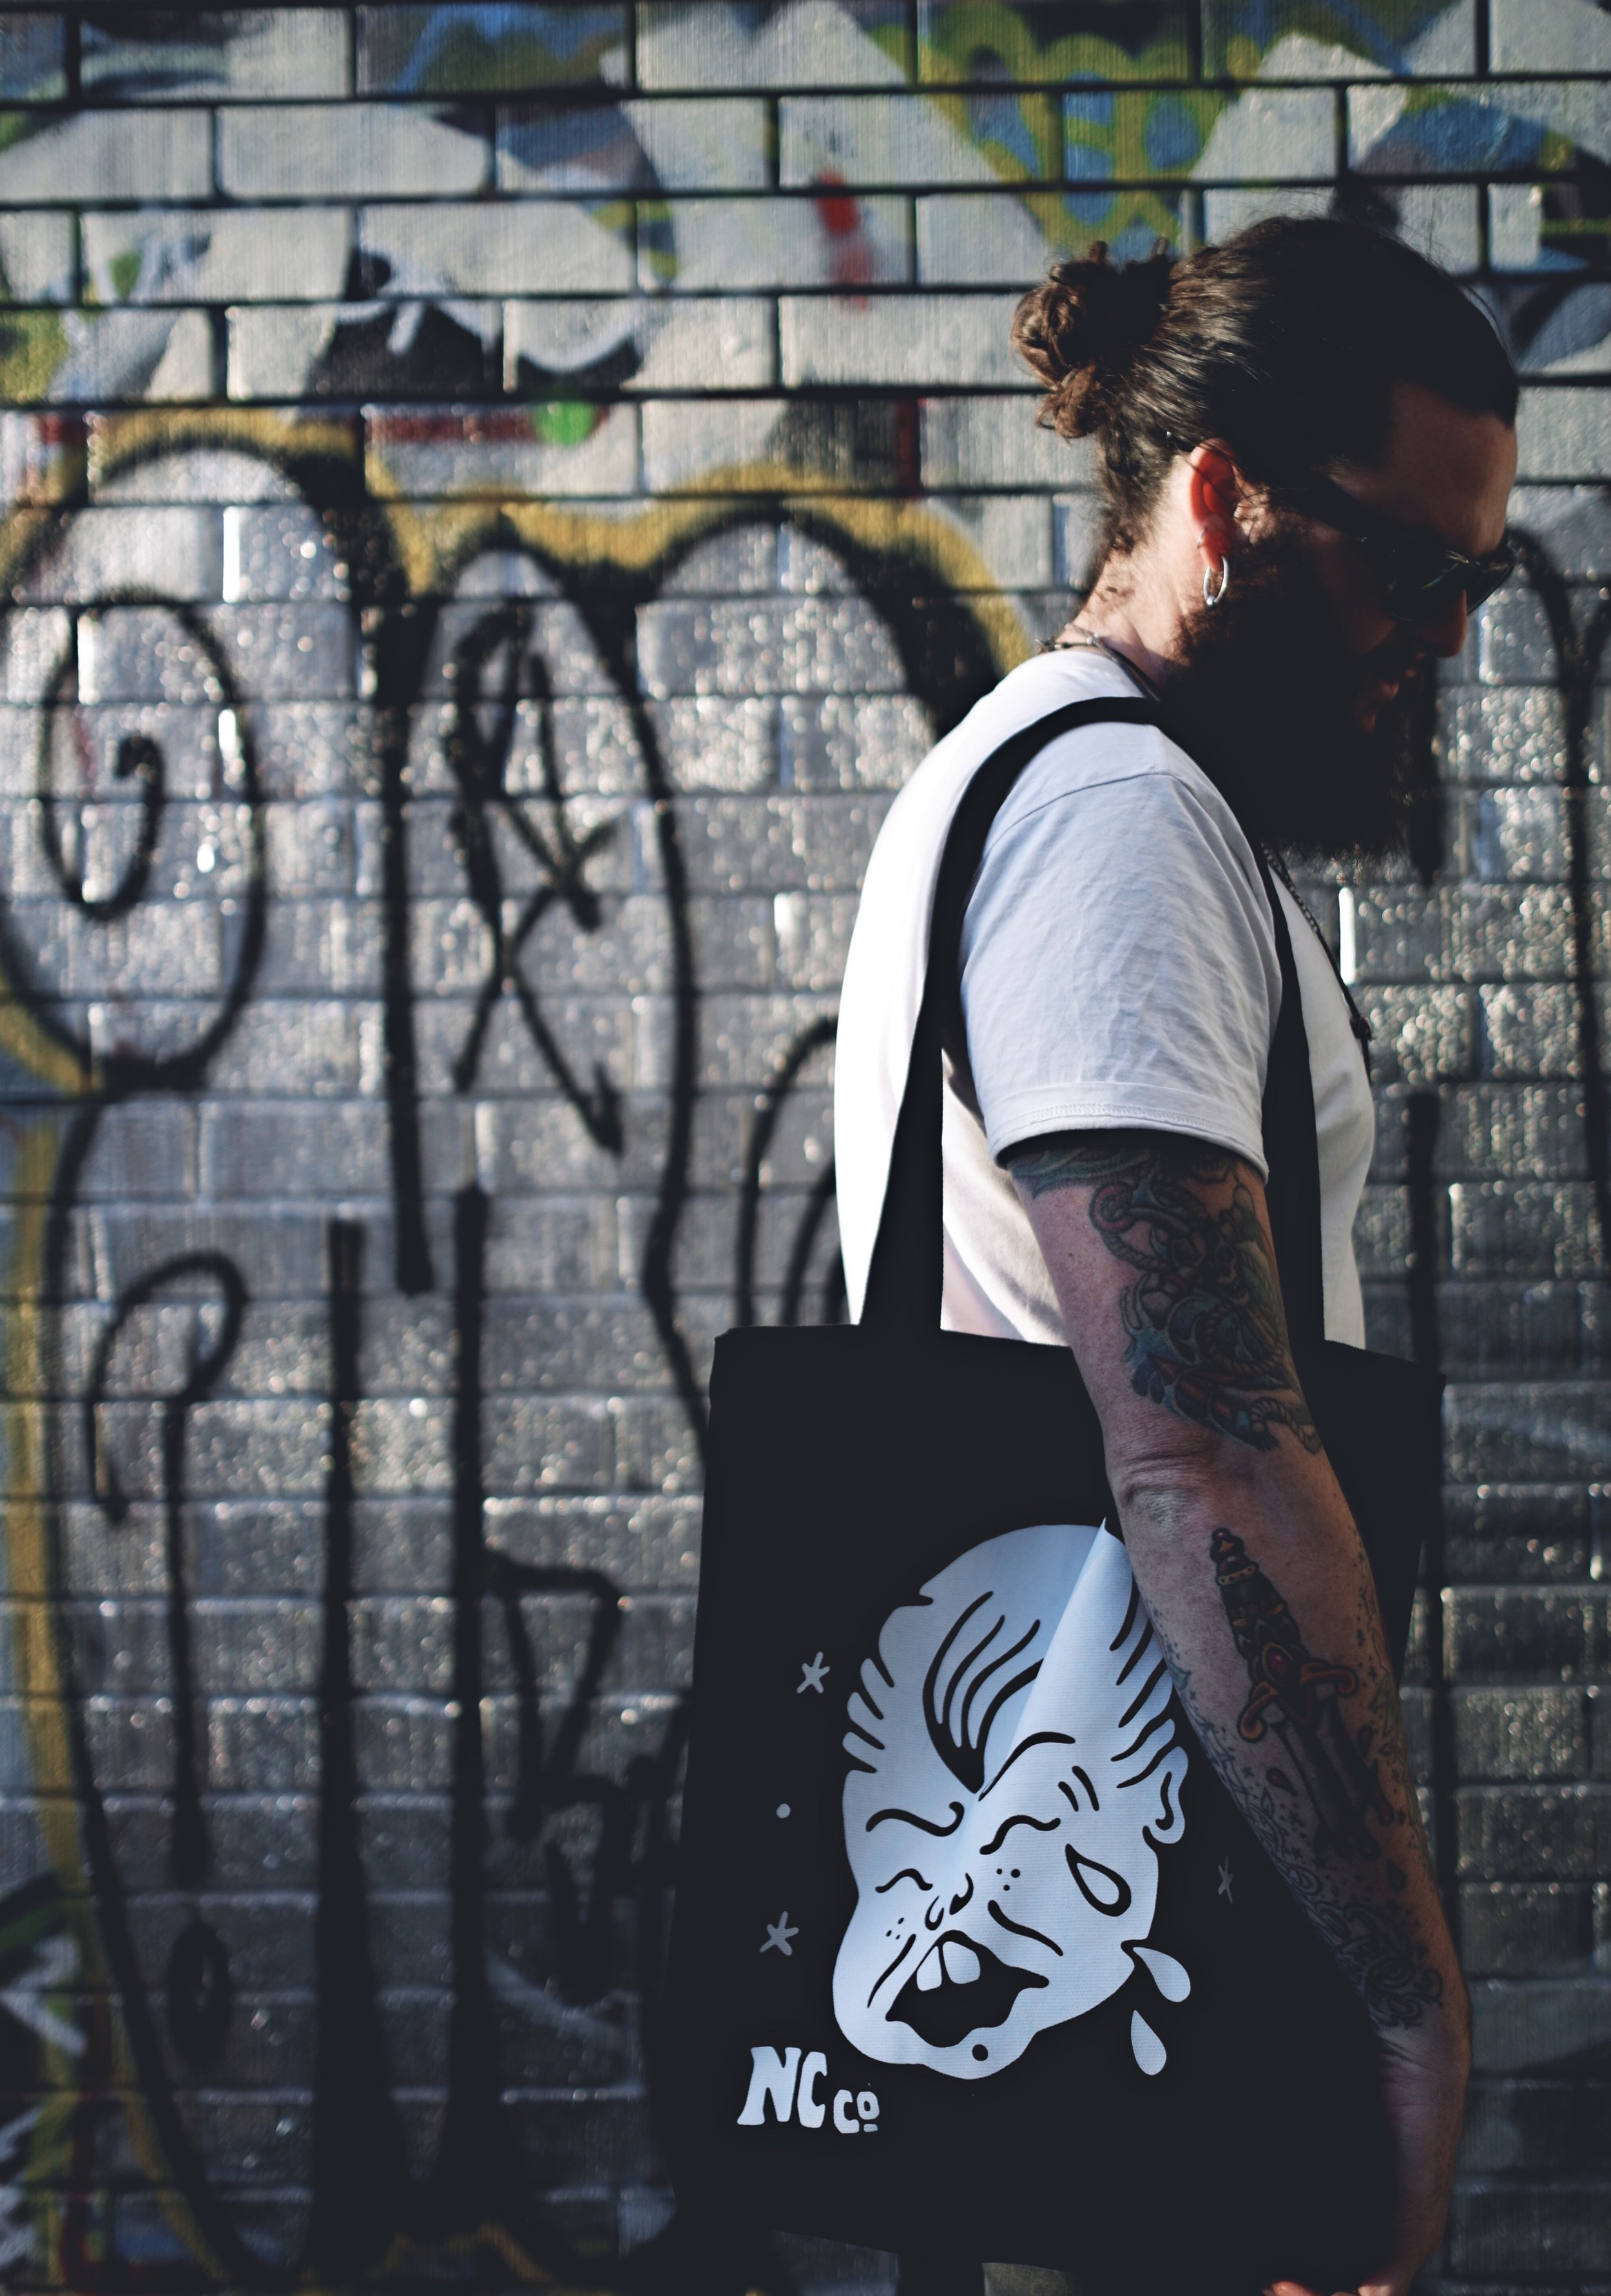 NC bag.jpg